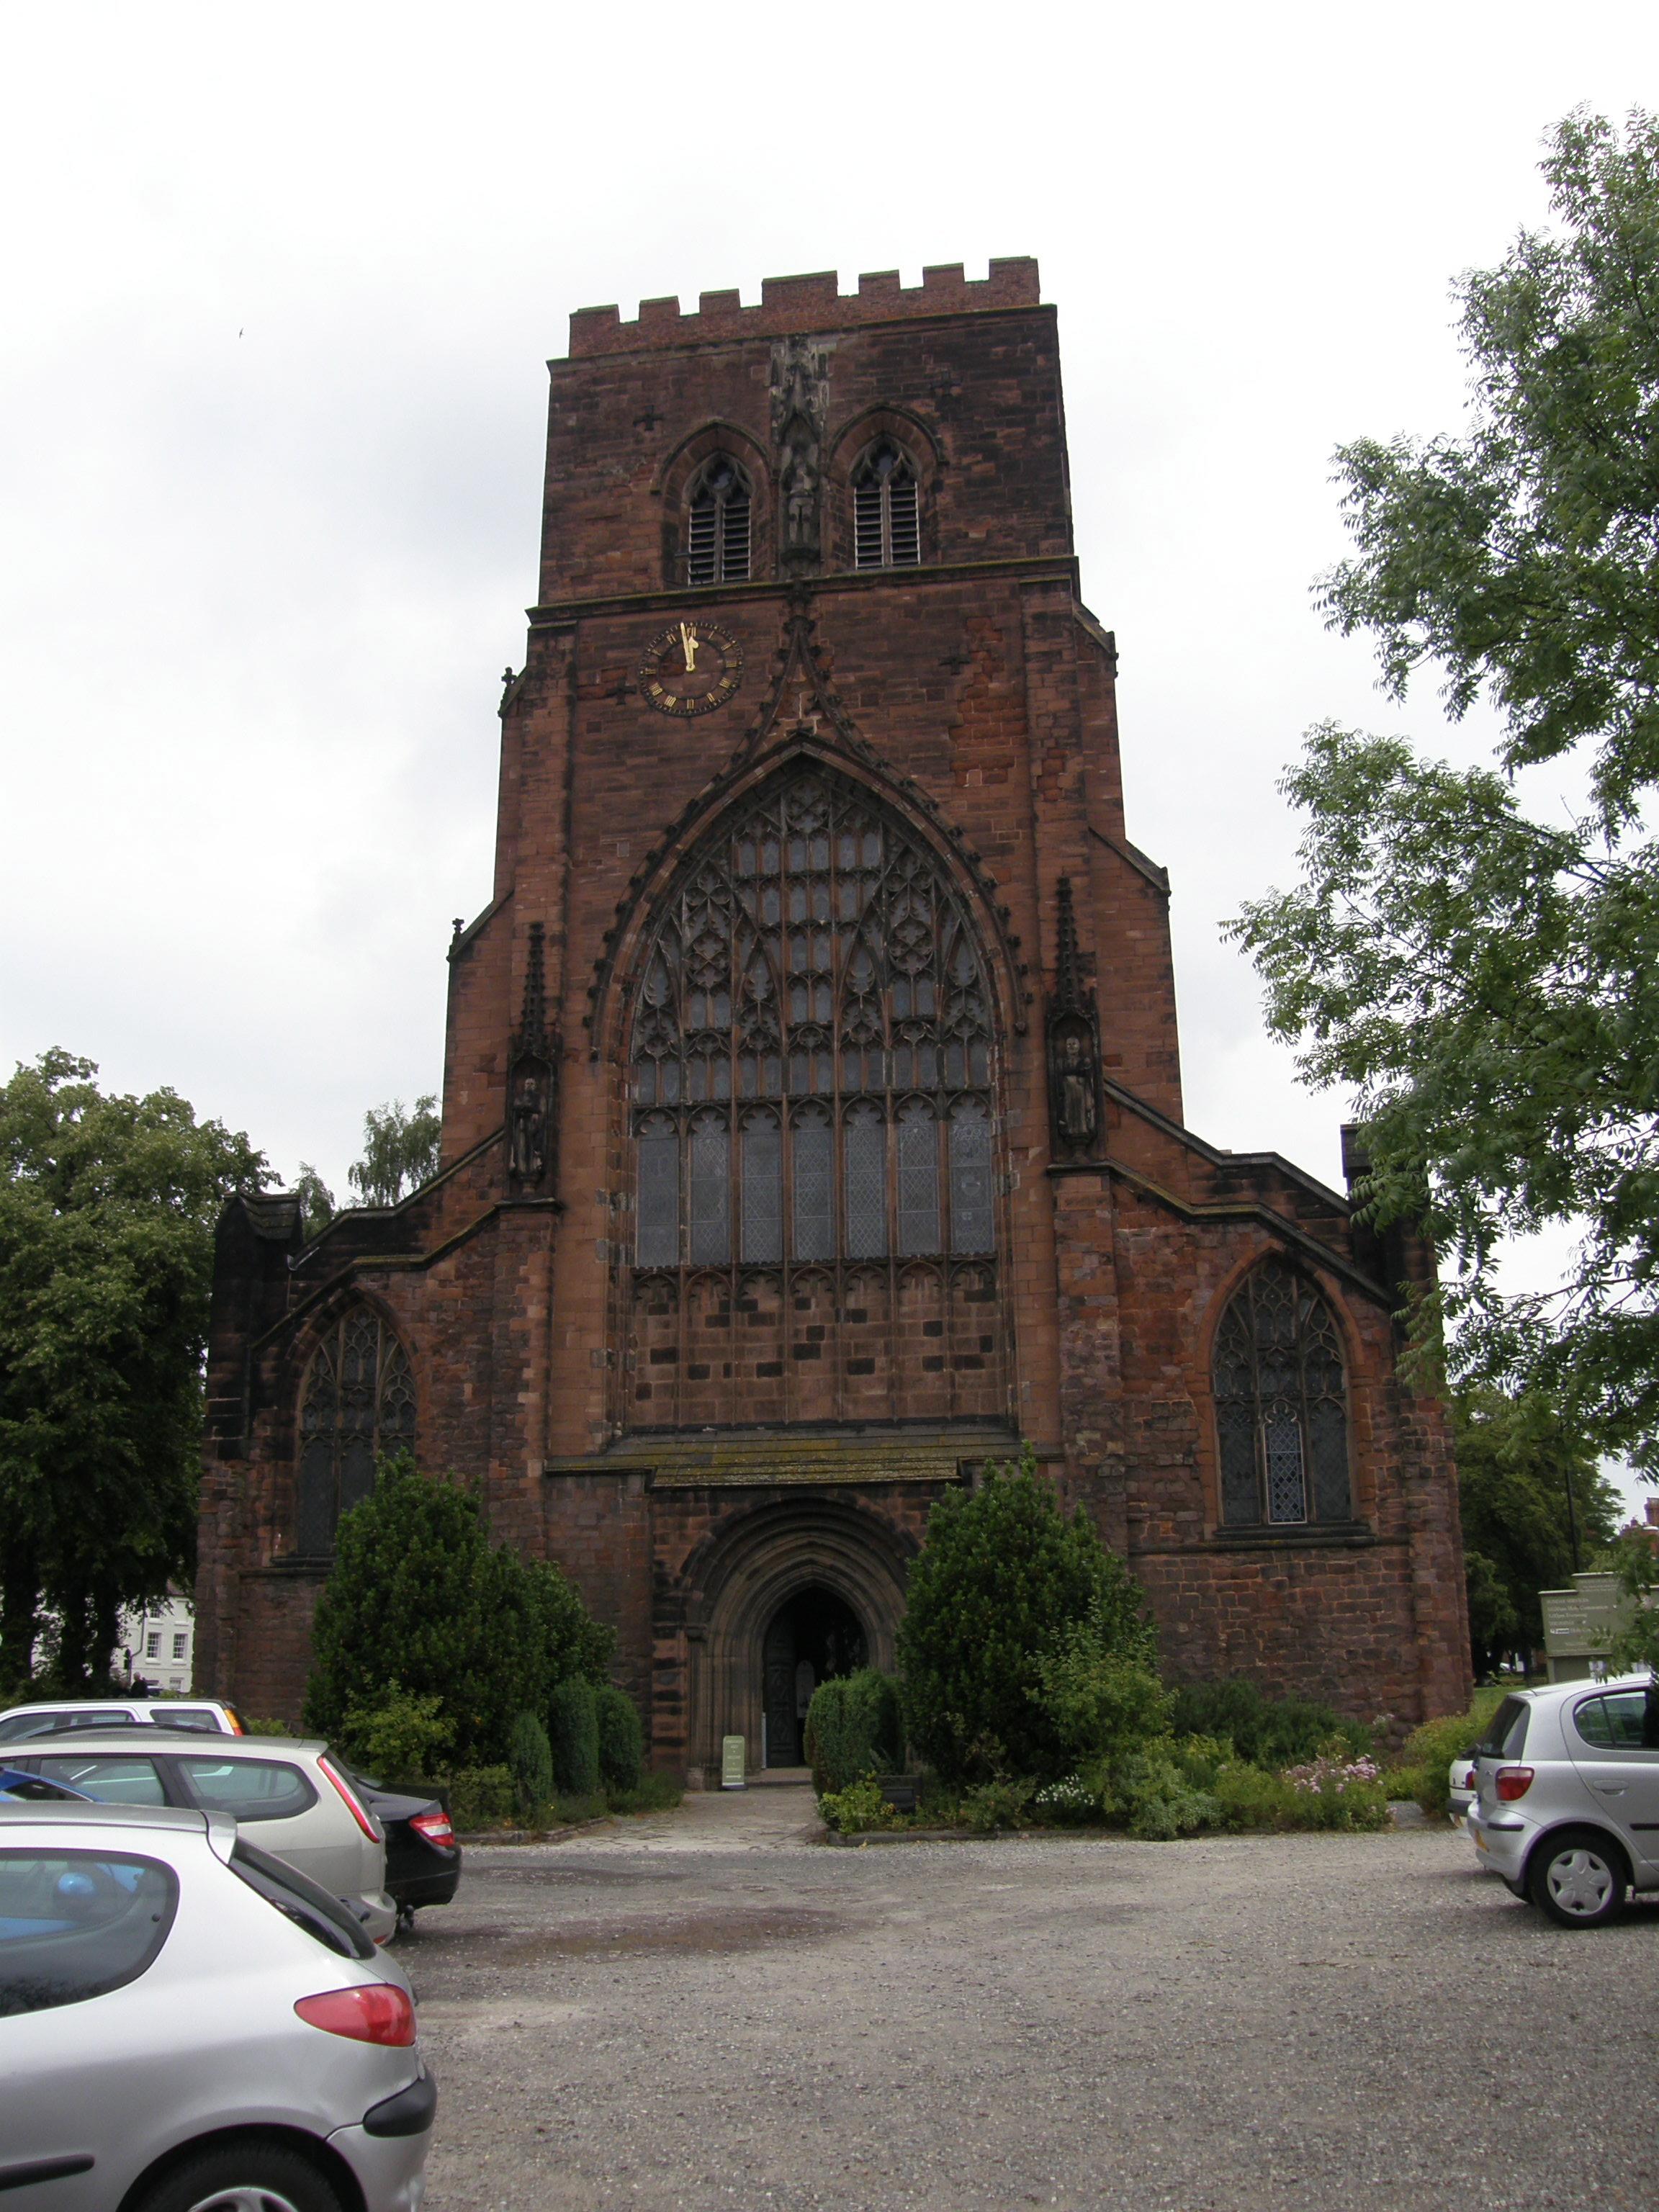 Facade of Shrewsbury Abbey Church